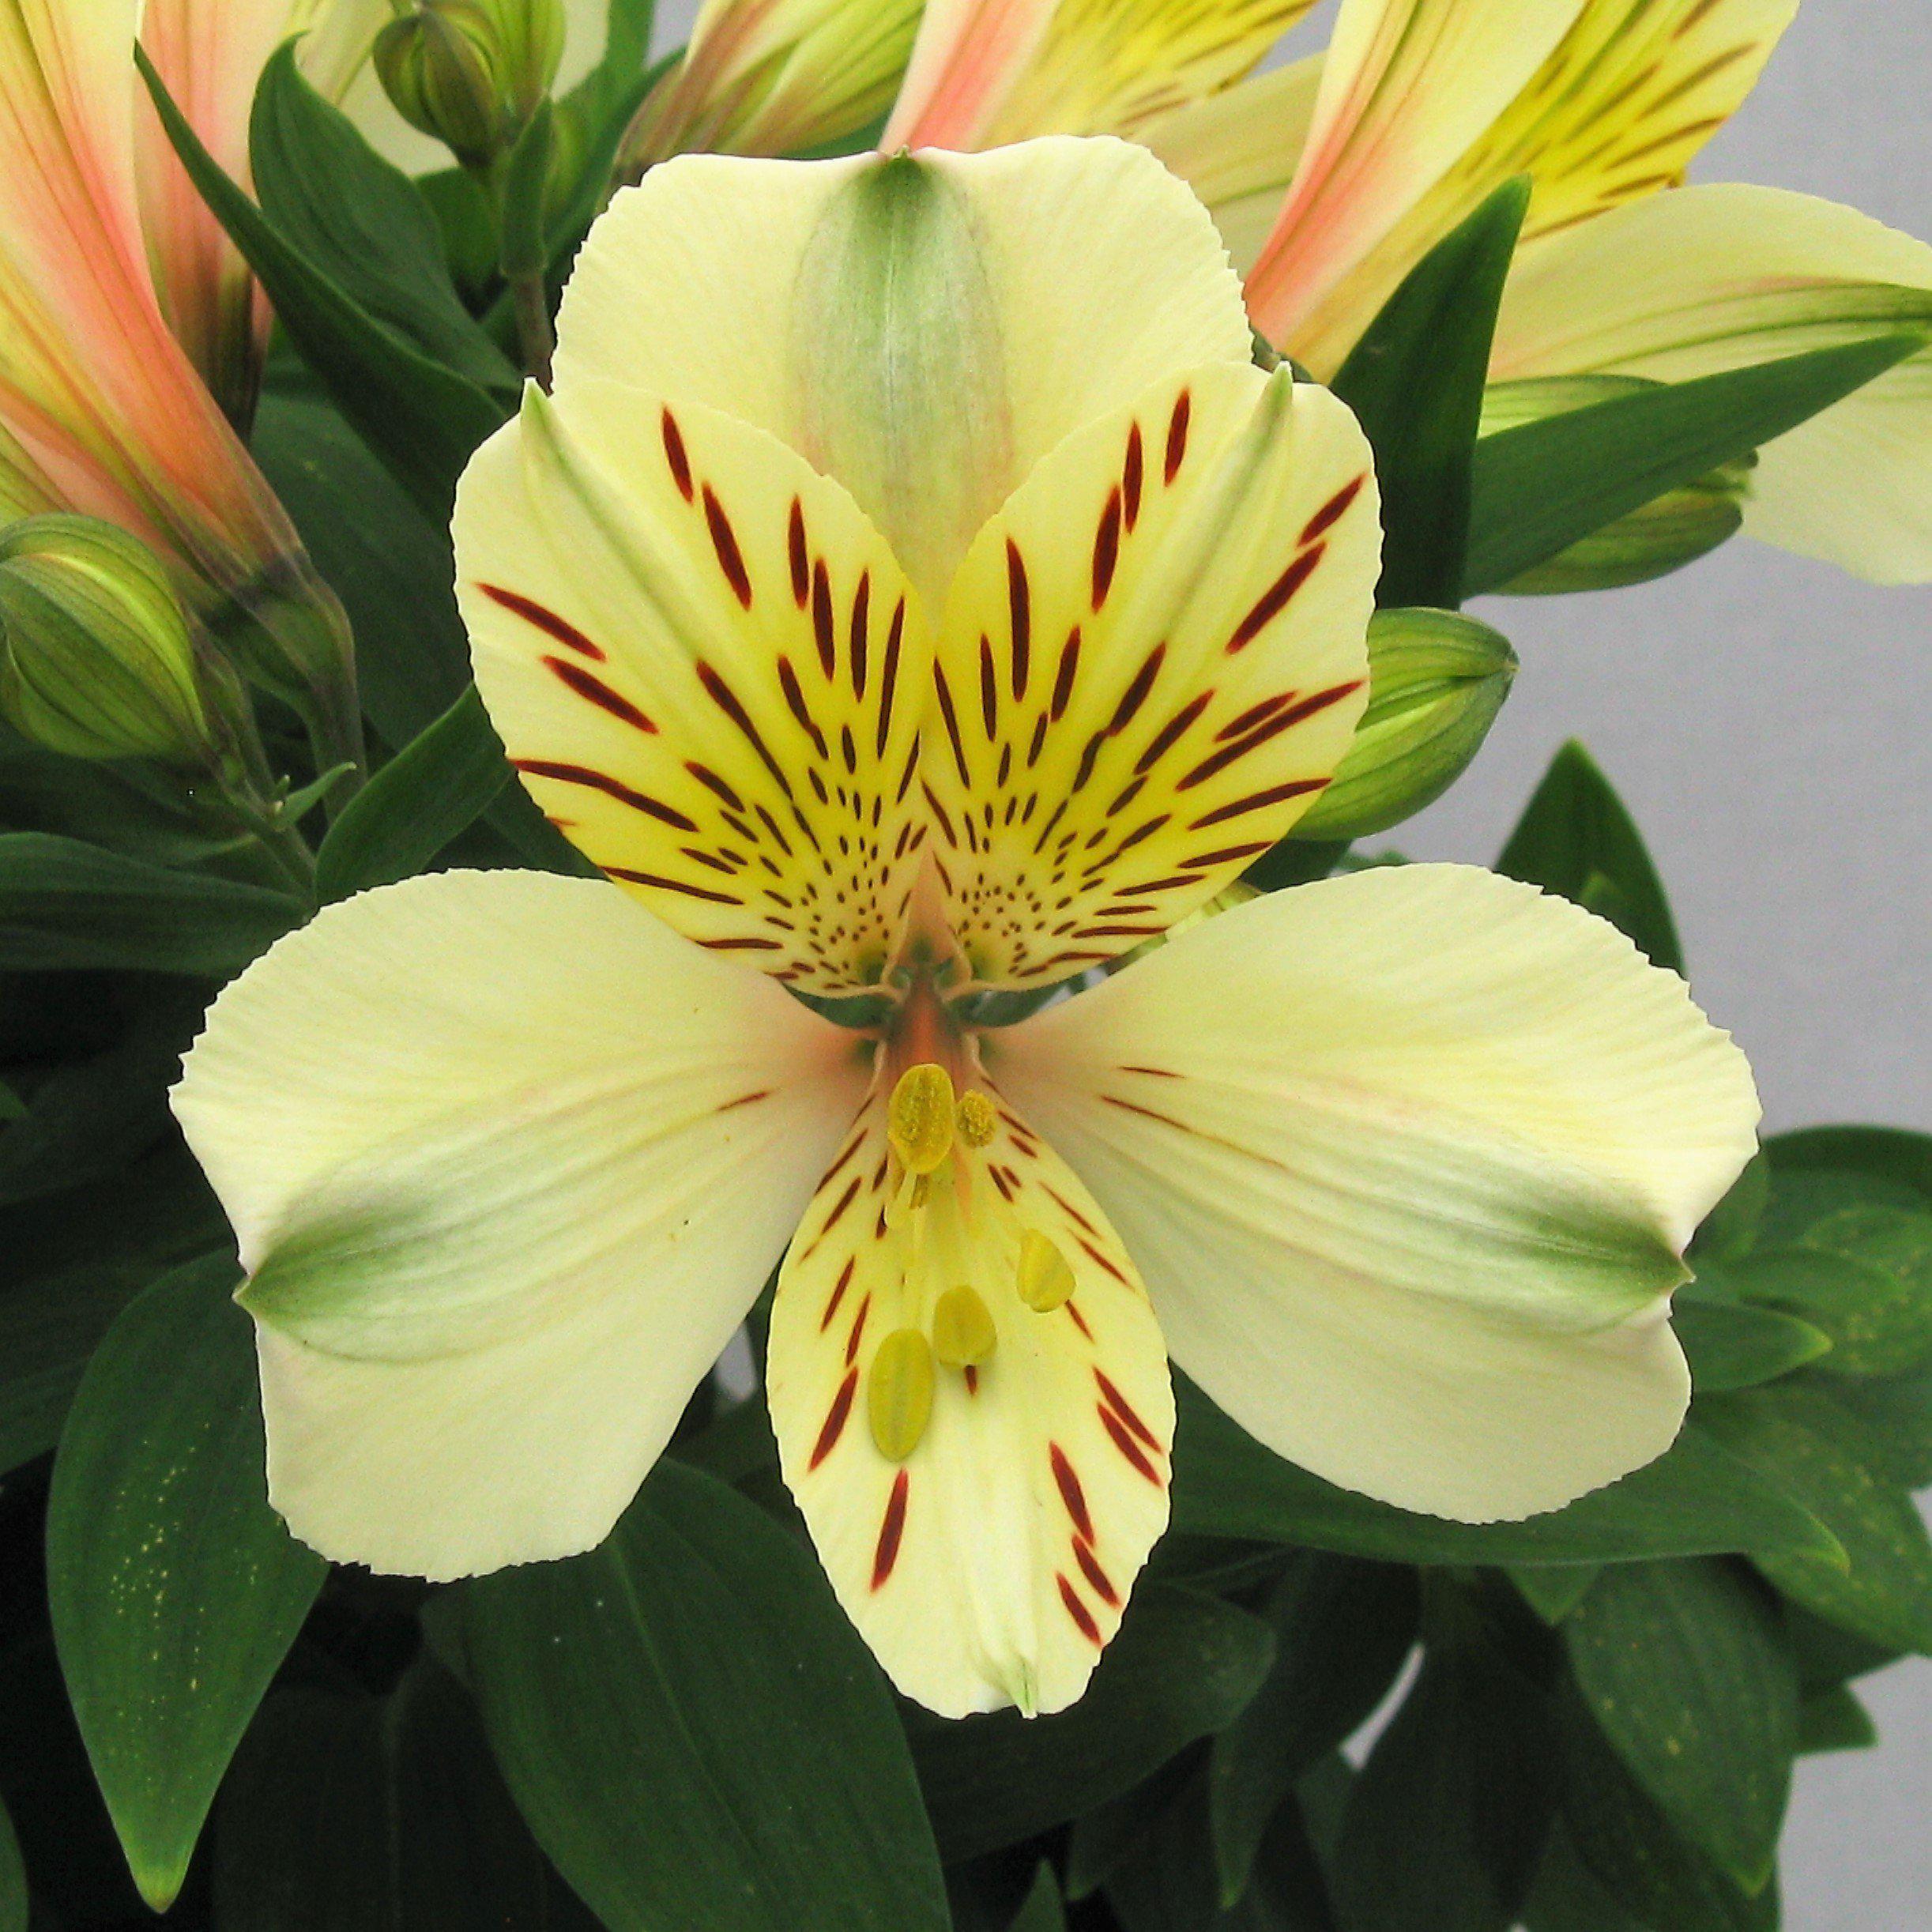 Allium Ampeloprasum Alstroemeria Easy To Grow Bulbs Lily Plants